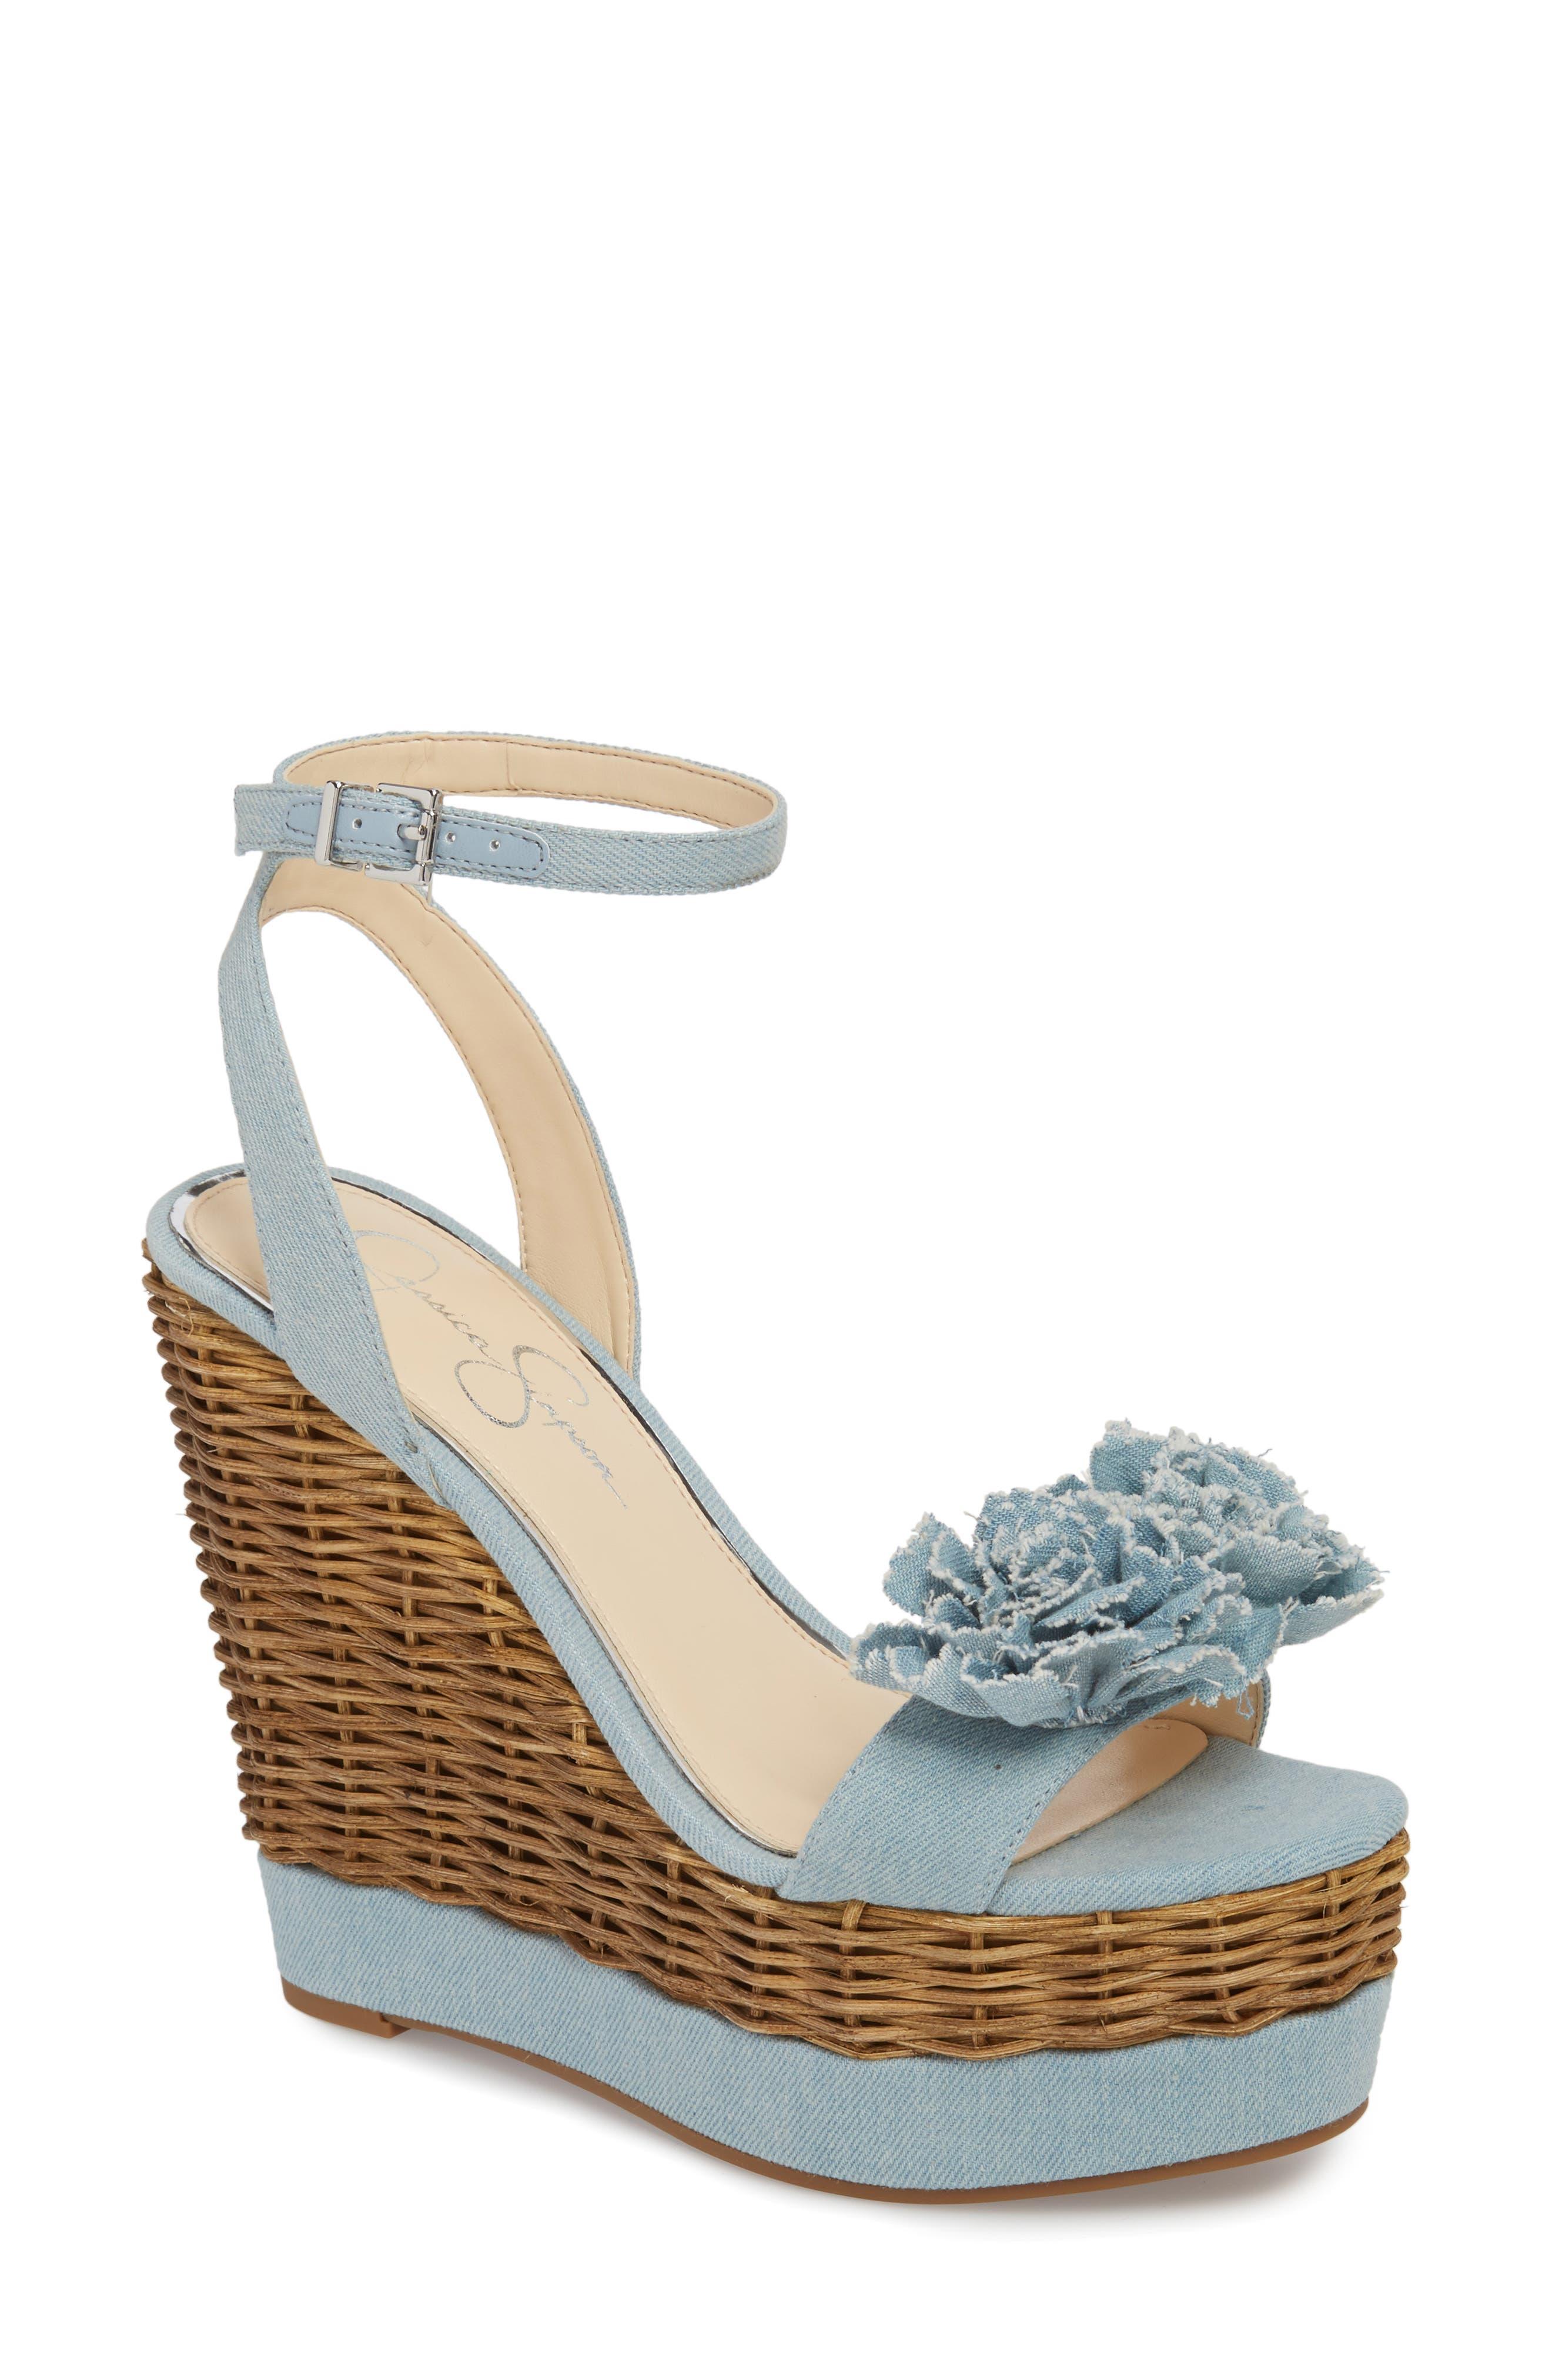 Pressa Platform Wedge Sandal,                             Main thumbnail 1, color,                             VINTAGE BLUE